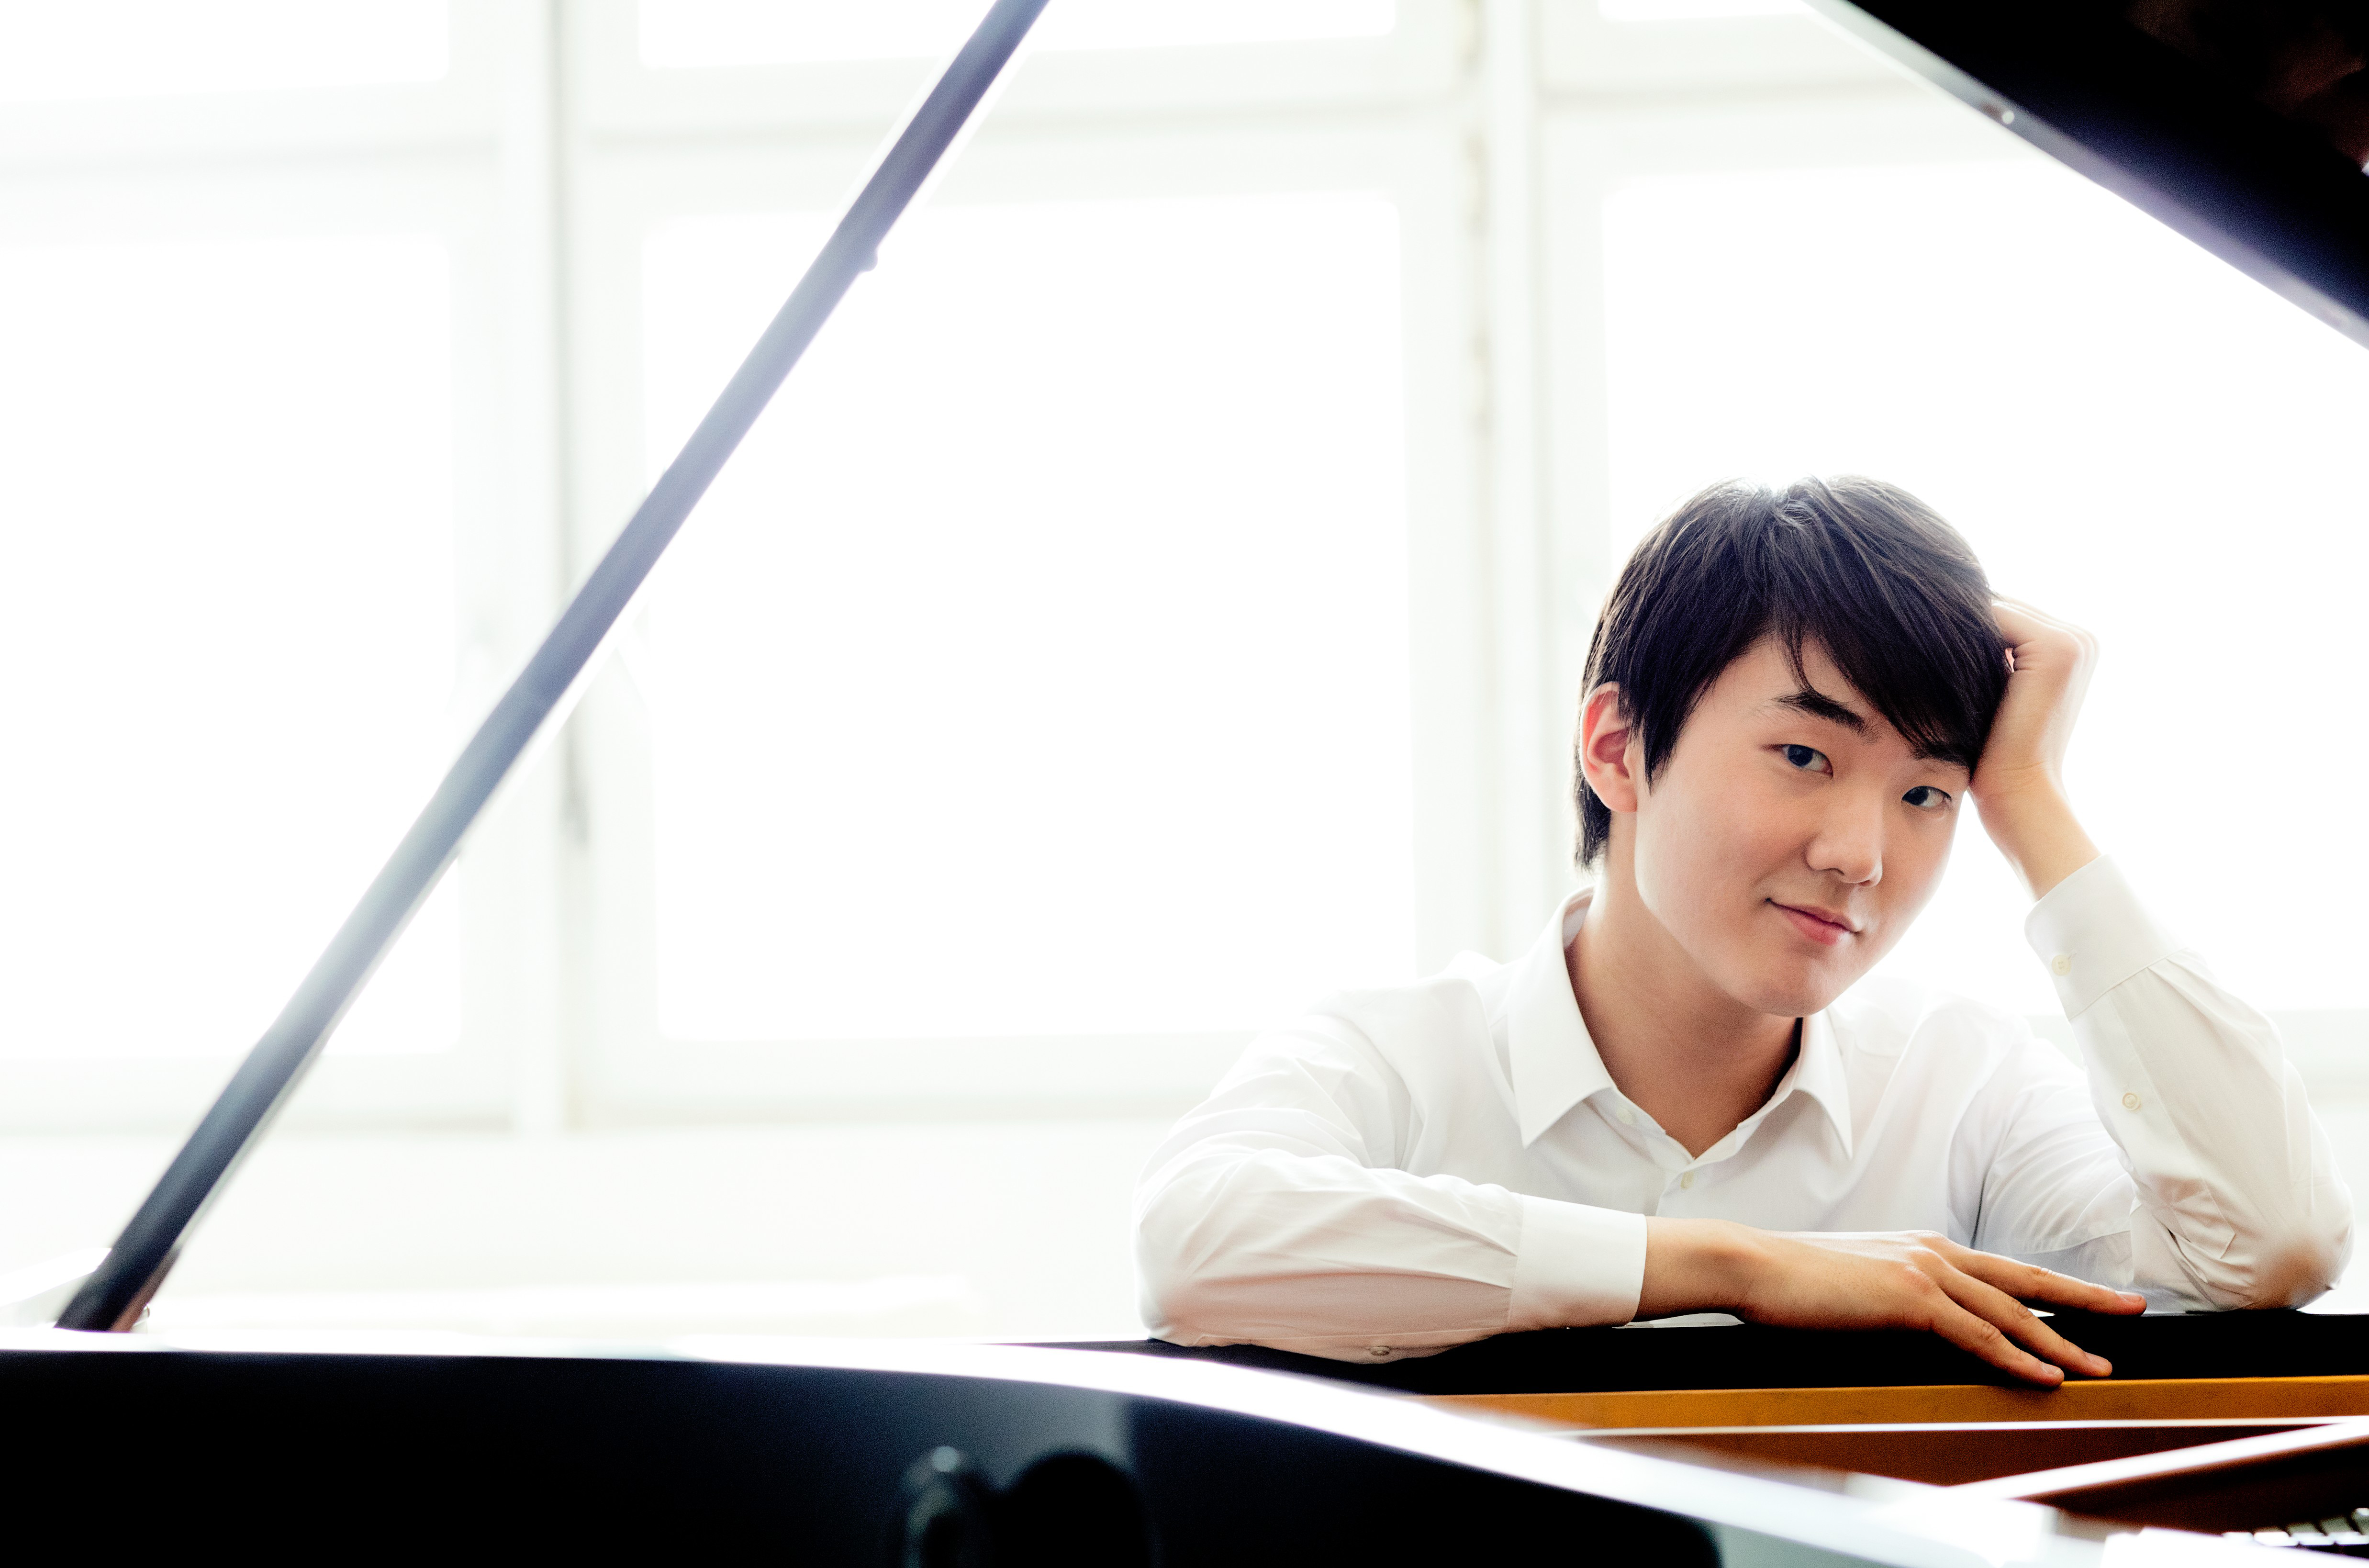 New Jersey Symphony Orchestra: Seong-Jin Cho Plays Chopin